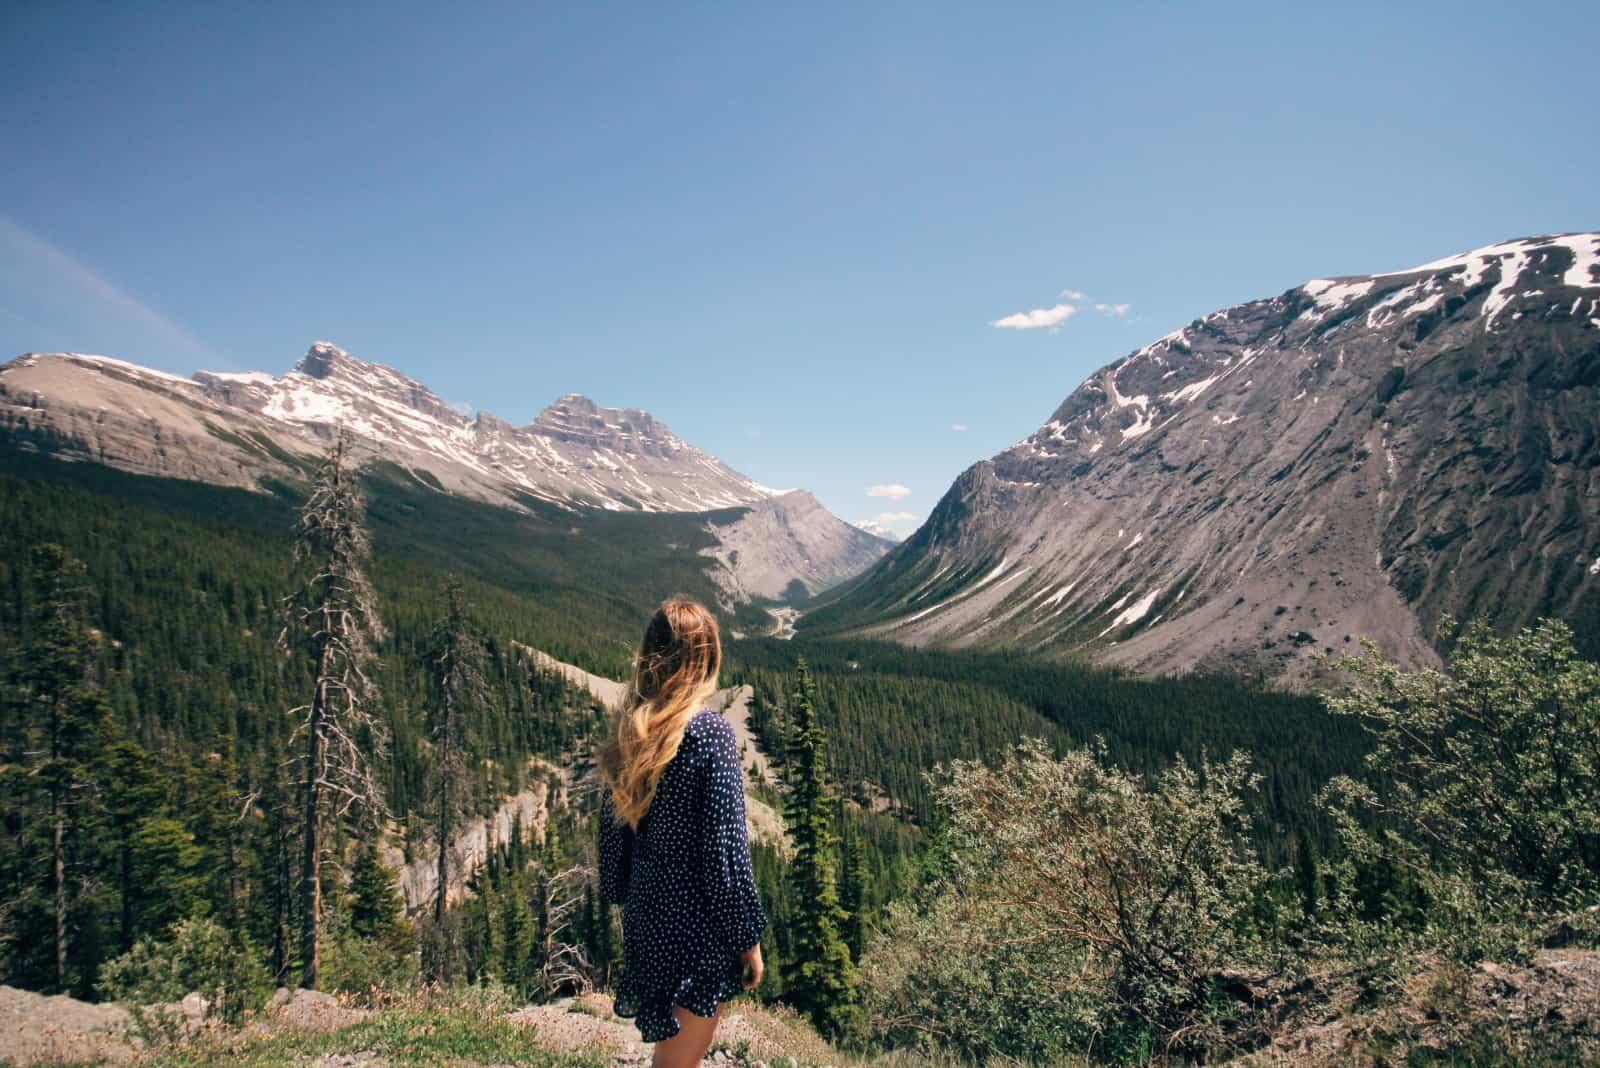 femme en robe bleue regardant la montagne